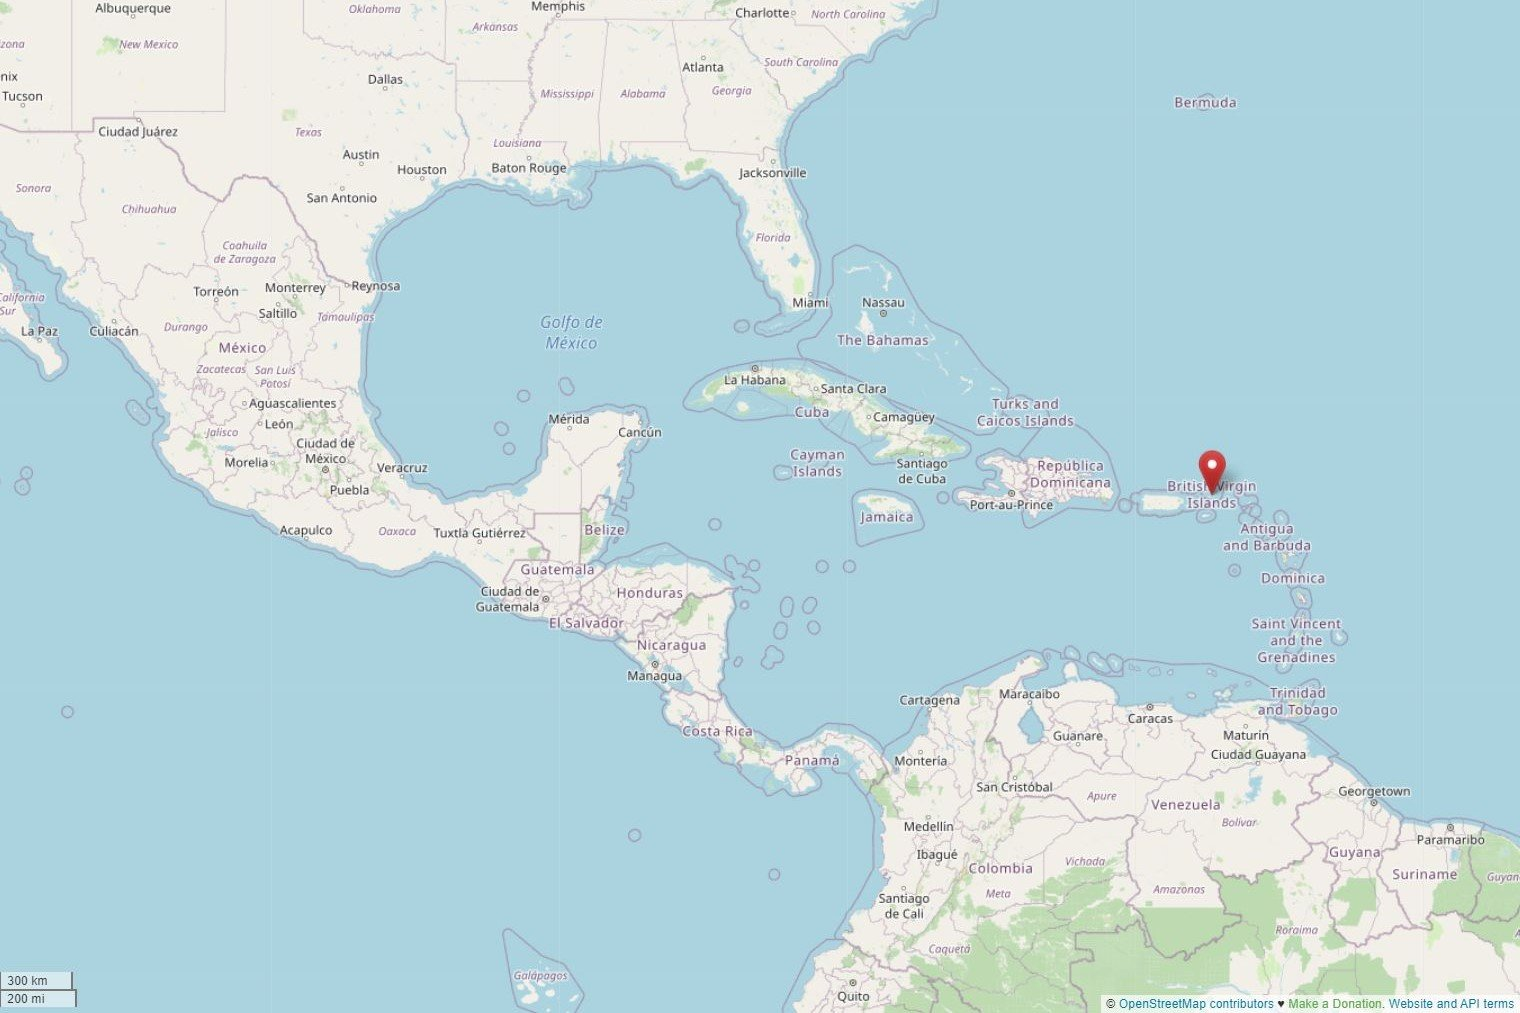 Spend your winter in the British Virgin Islands - Is the British Virgin Islands a good snowbird location 2